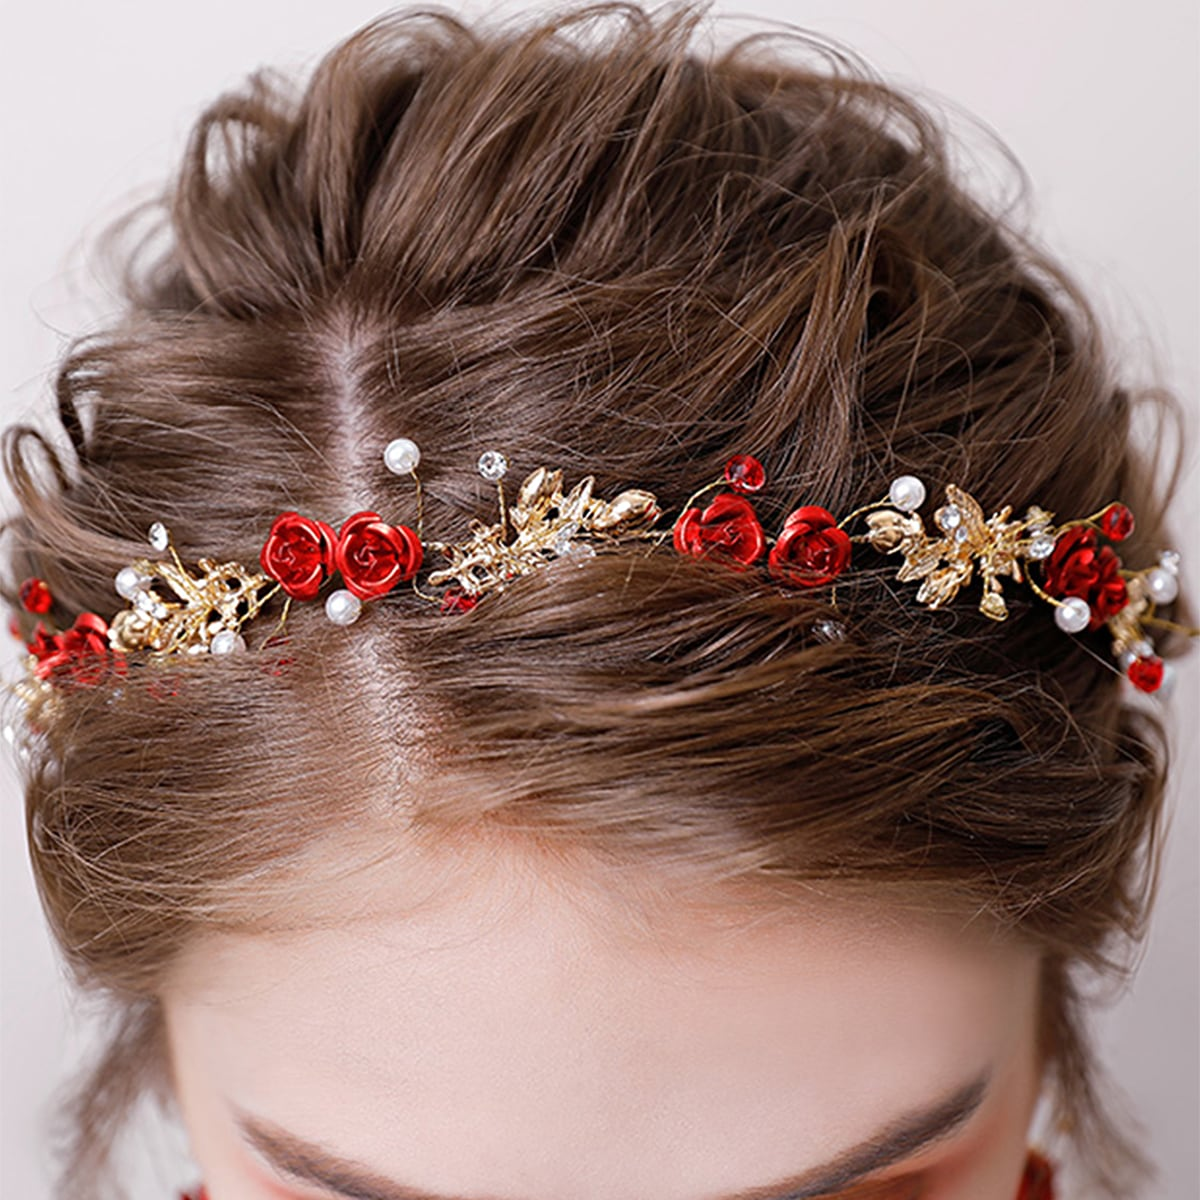 Аксессуар для волос с декором розы фото